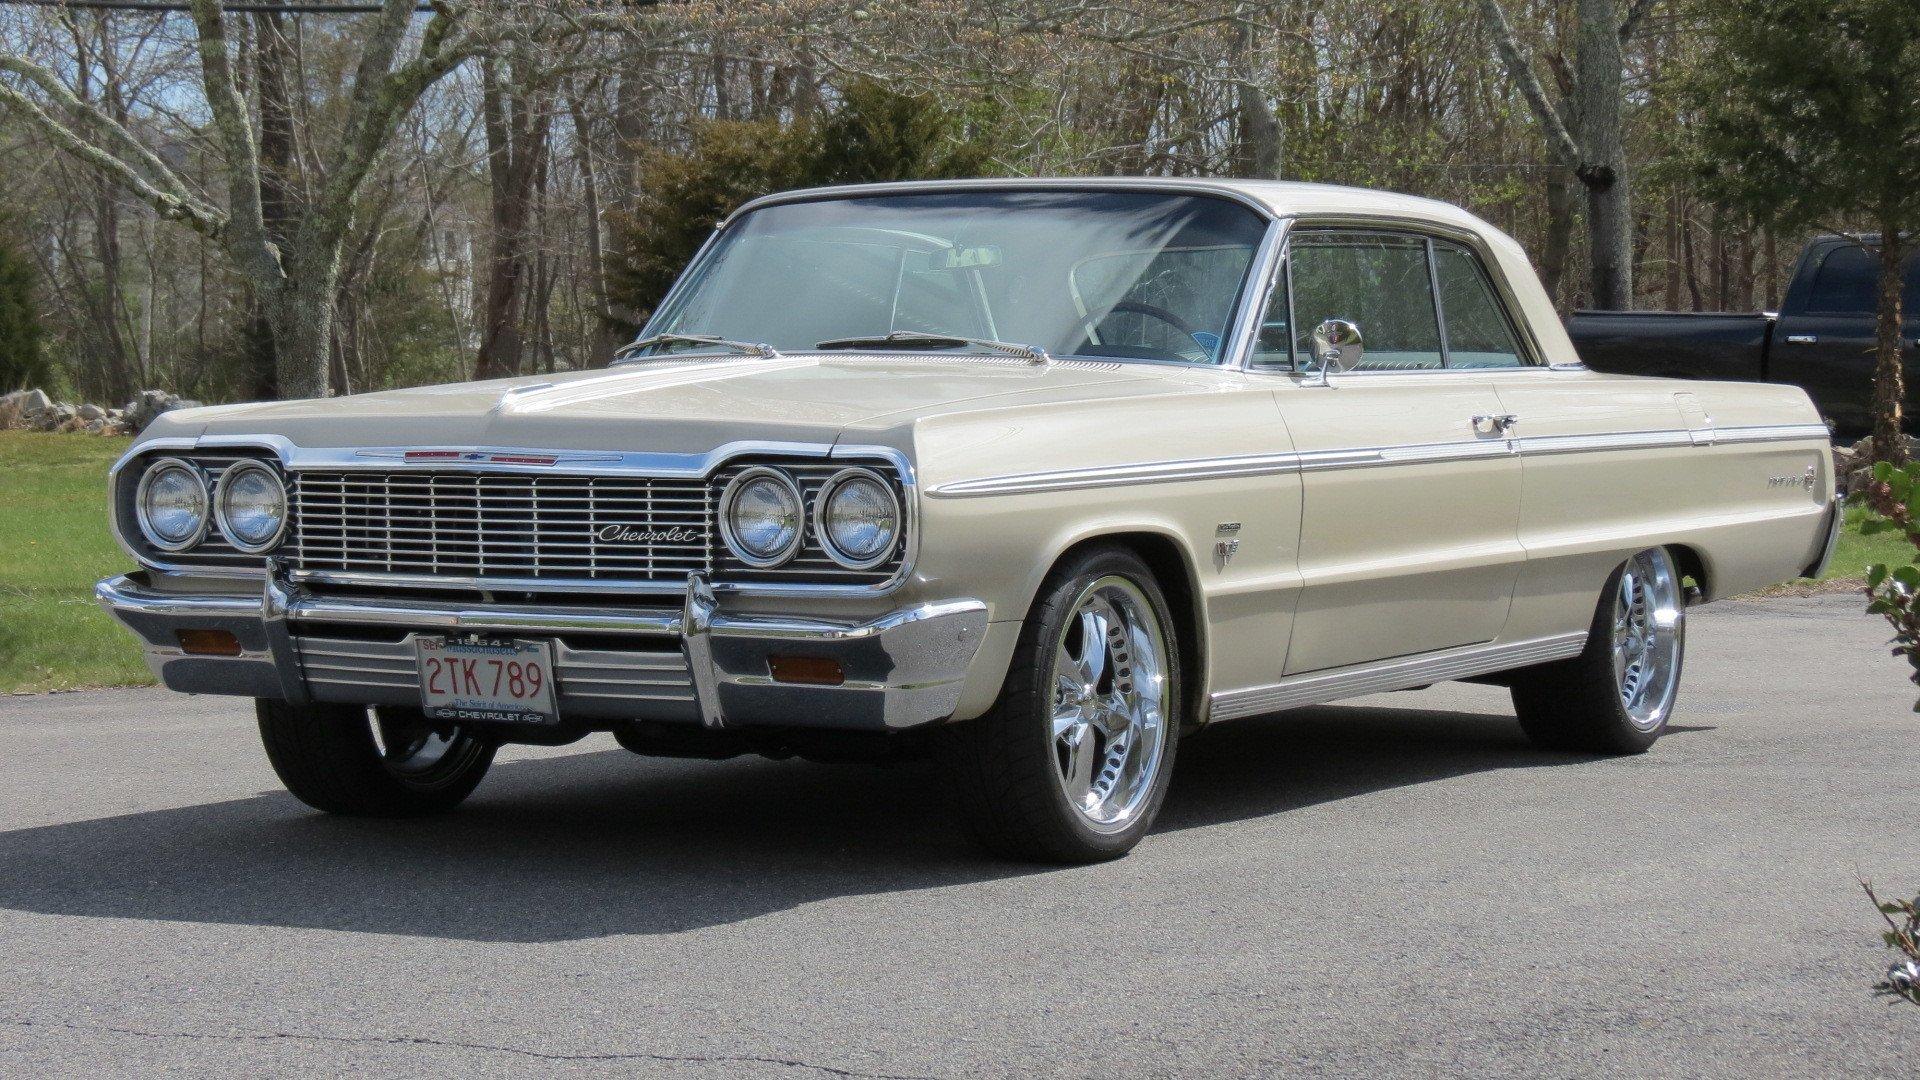 Kelebihan Chevrolet Impala 1964 Harga